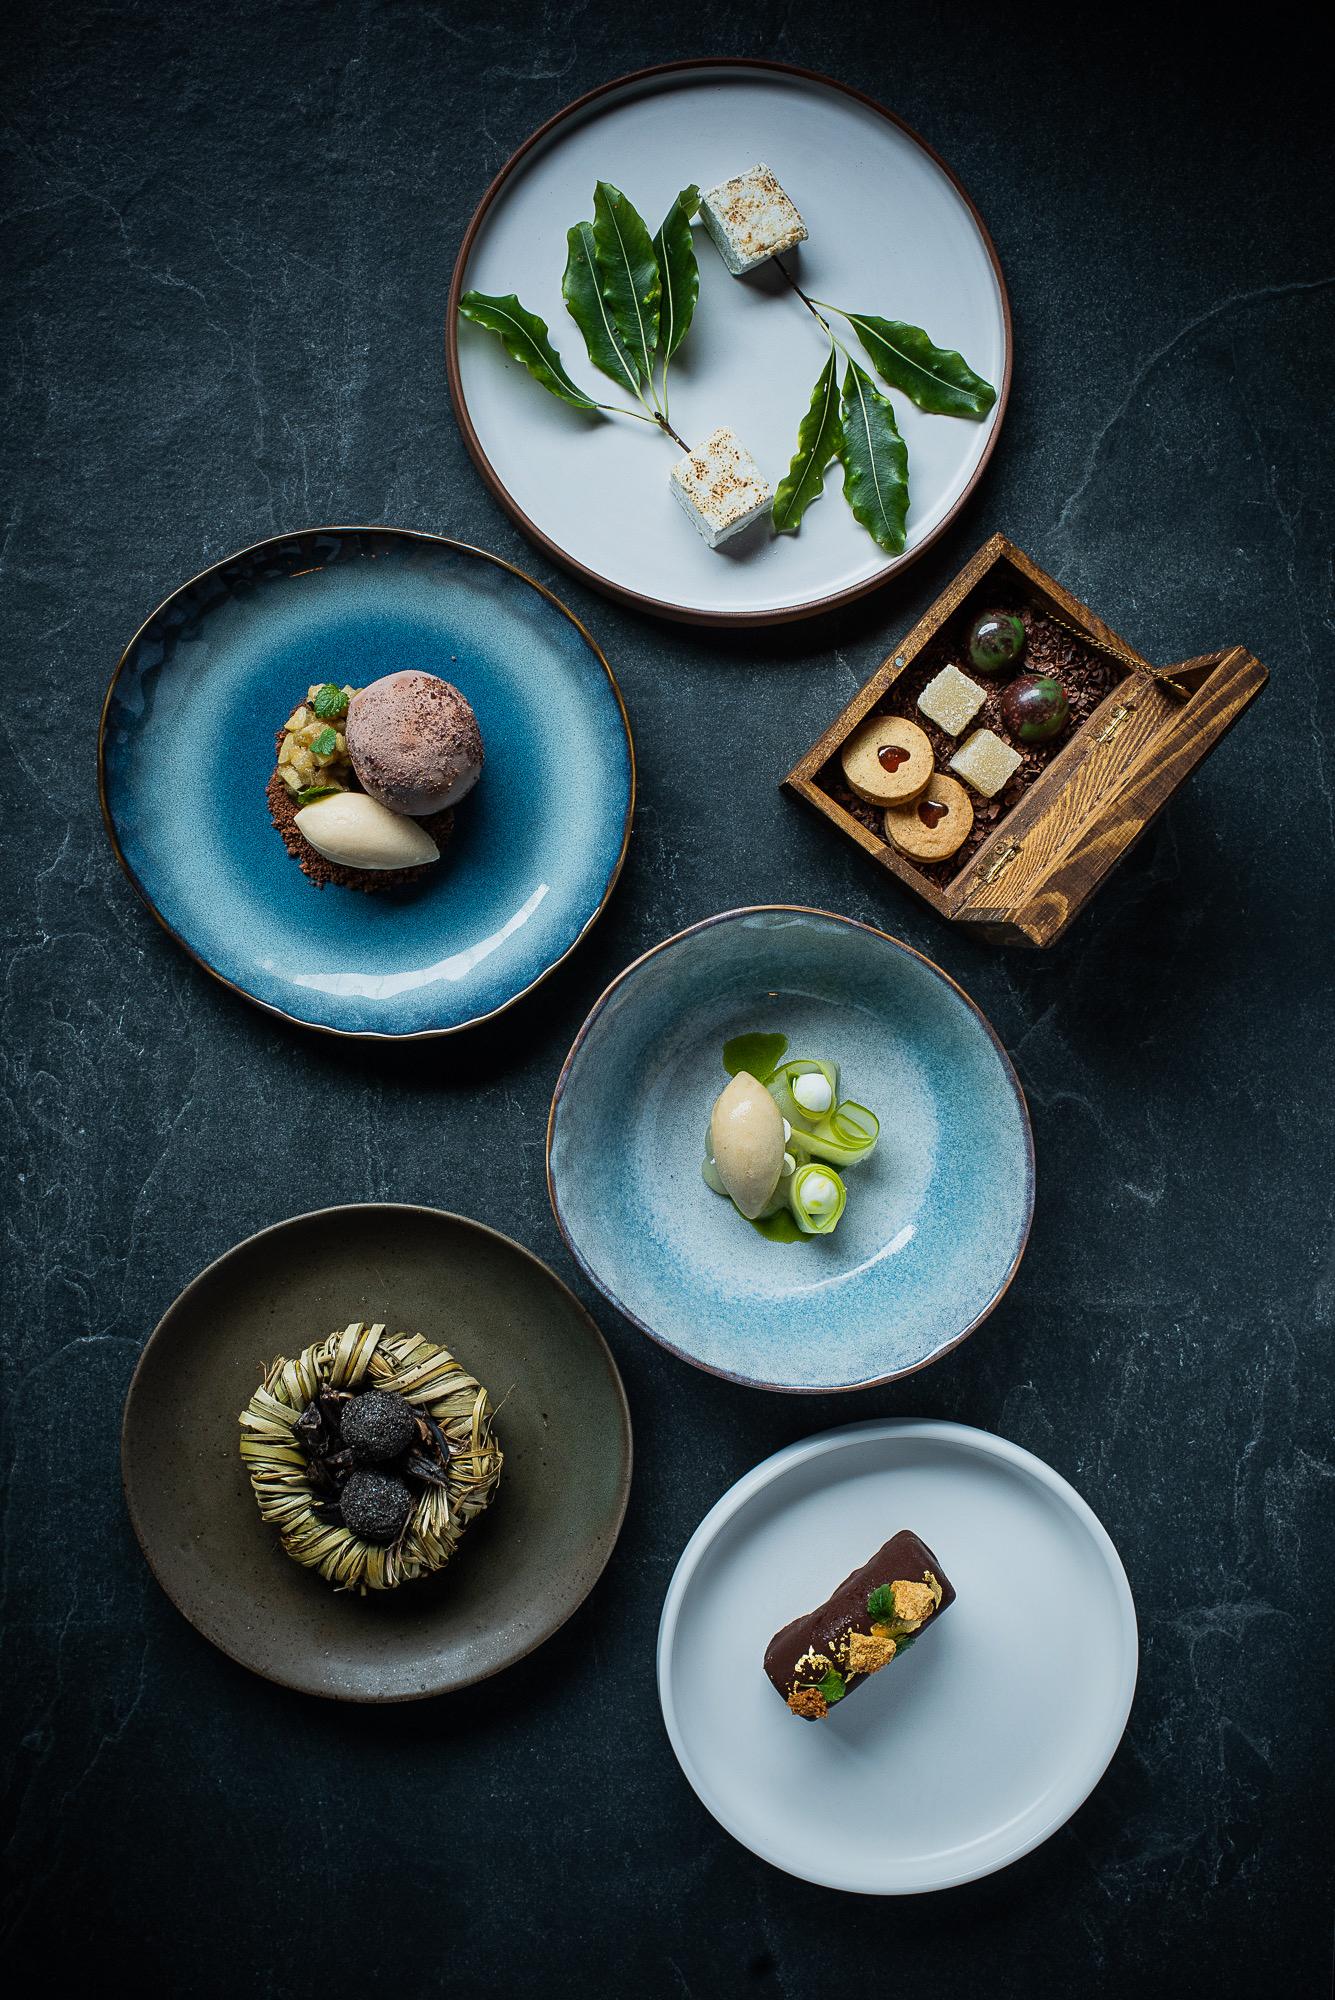 Hiakai Desserts